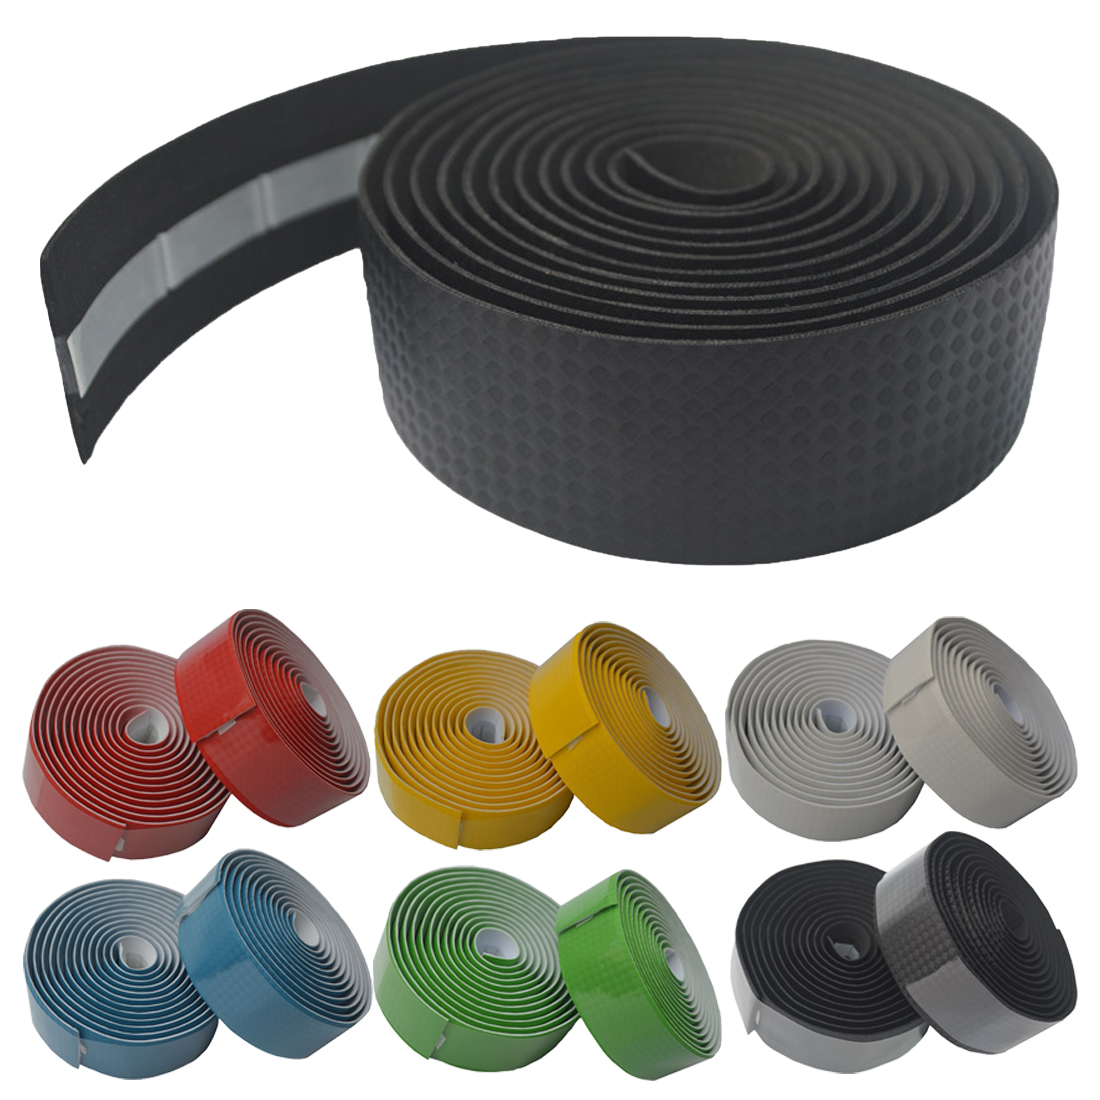 1 Pair Red Comfy Non-Slip Synthetic Cork Bike Handlebar Grip Tape w// Plugs